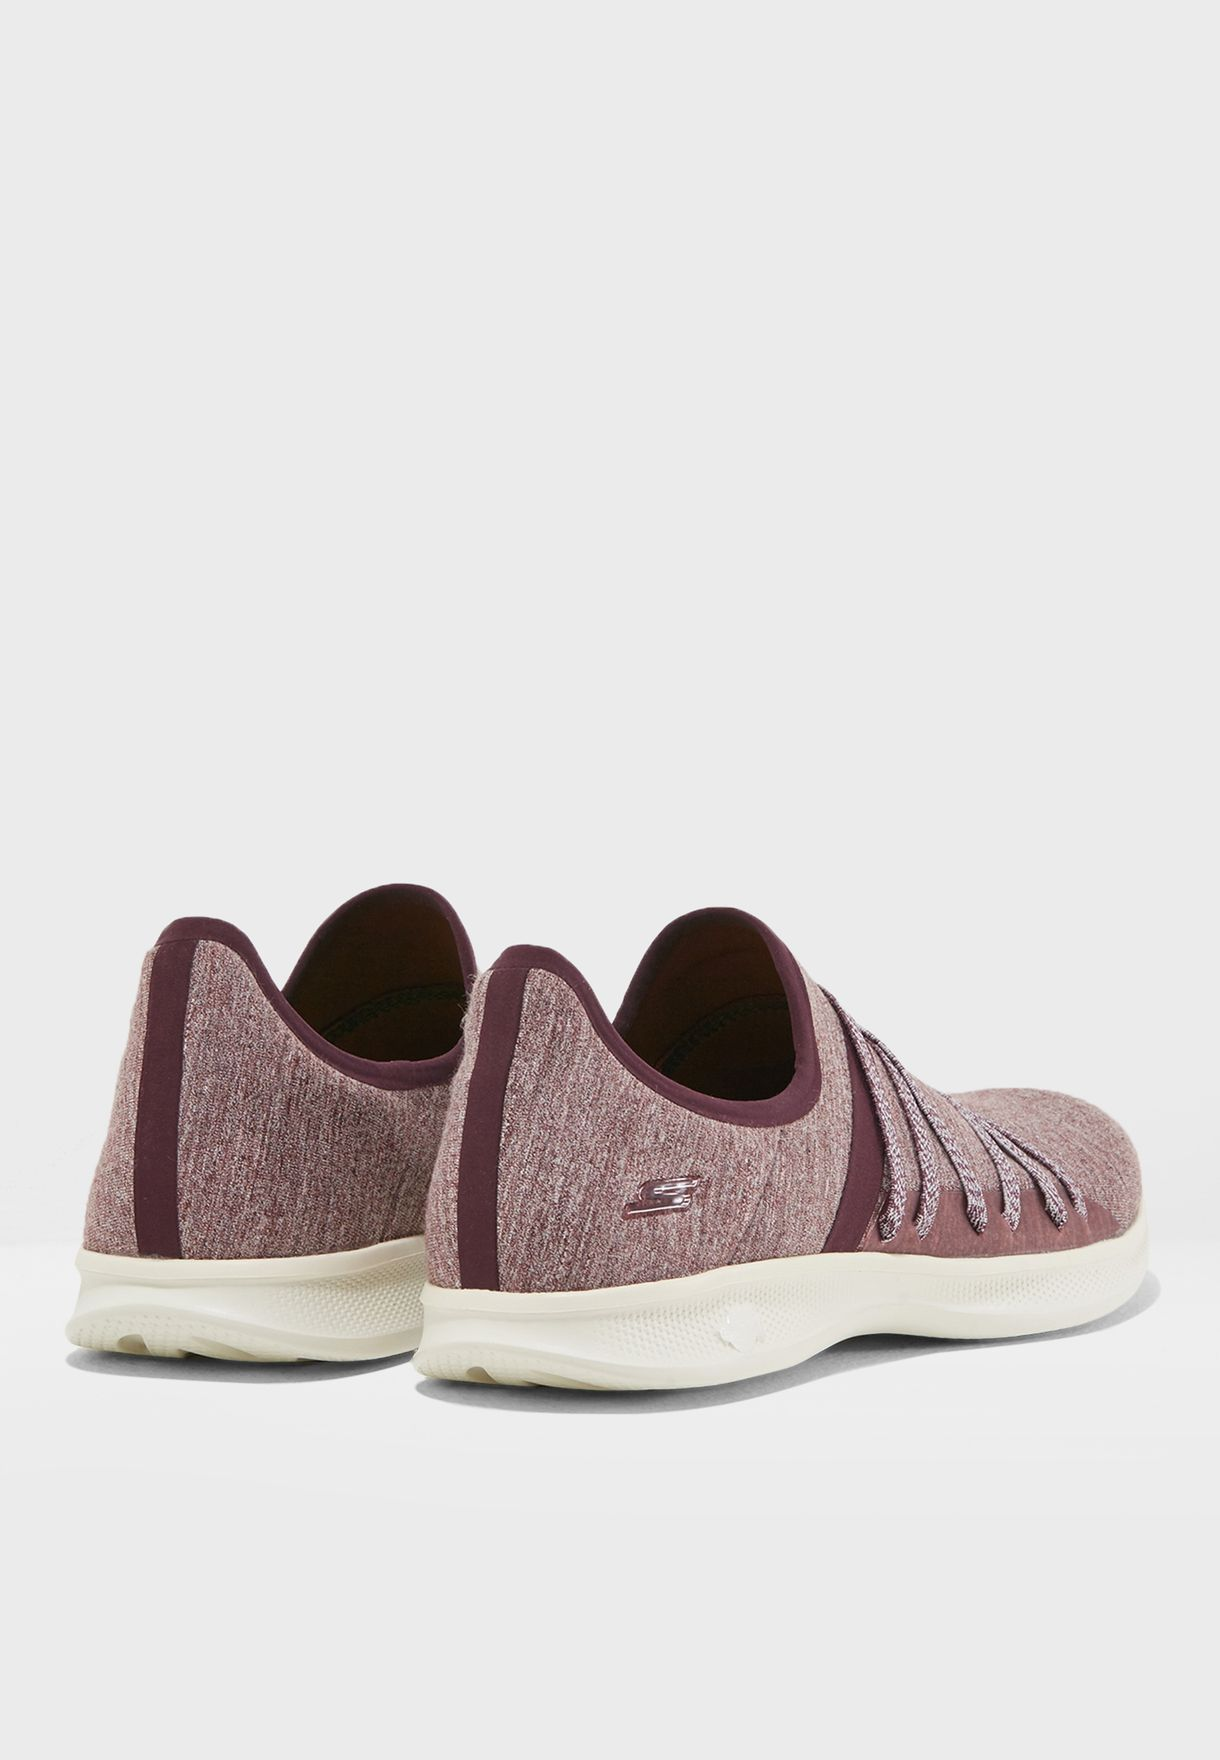 حذاء جو ستيب لايت - ستريفد